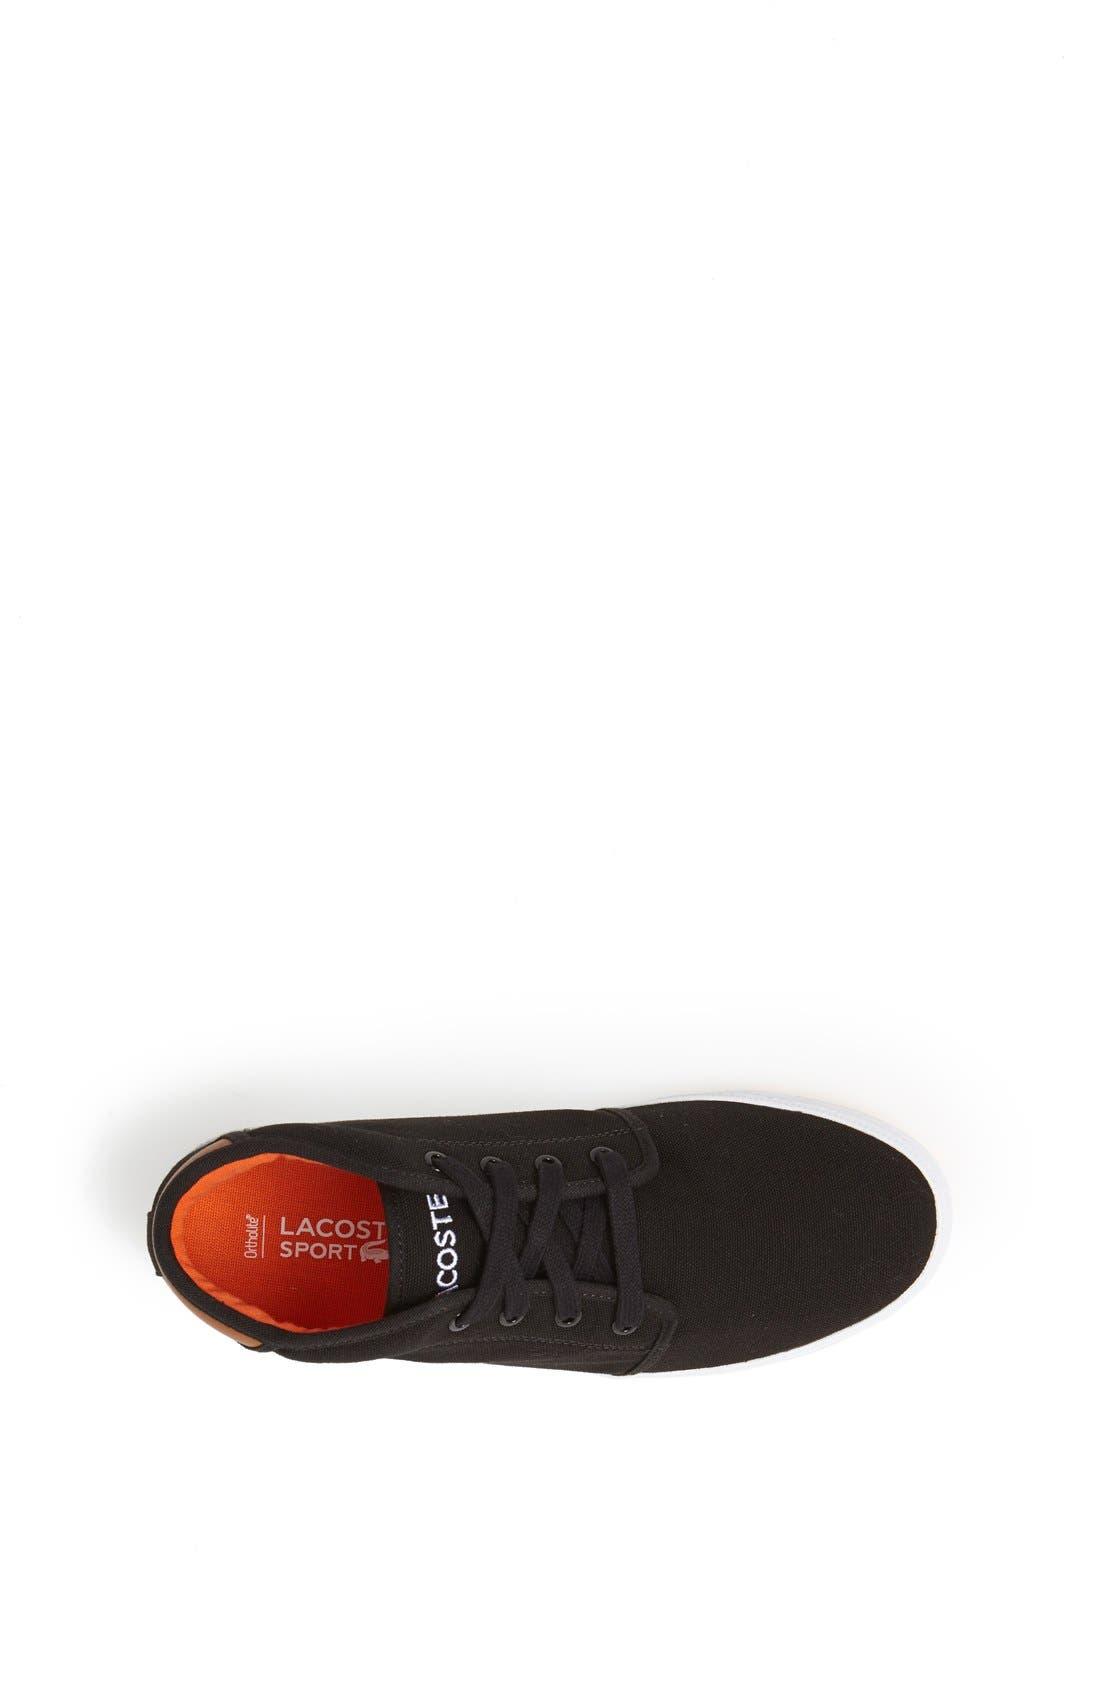 Alternate Image 3  - Lacoste 'Ampthill' Canvas Sneaker (Baby, Walker, Toddler, Little Kid & Big Kid)